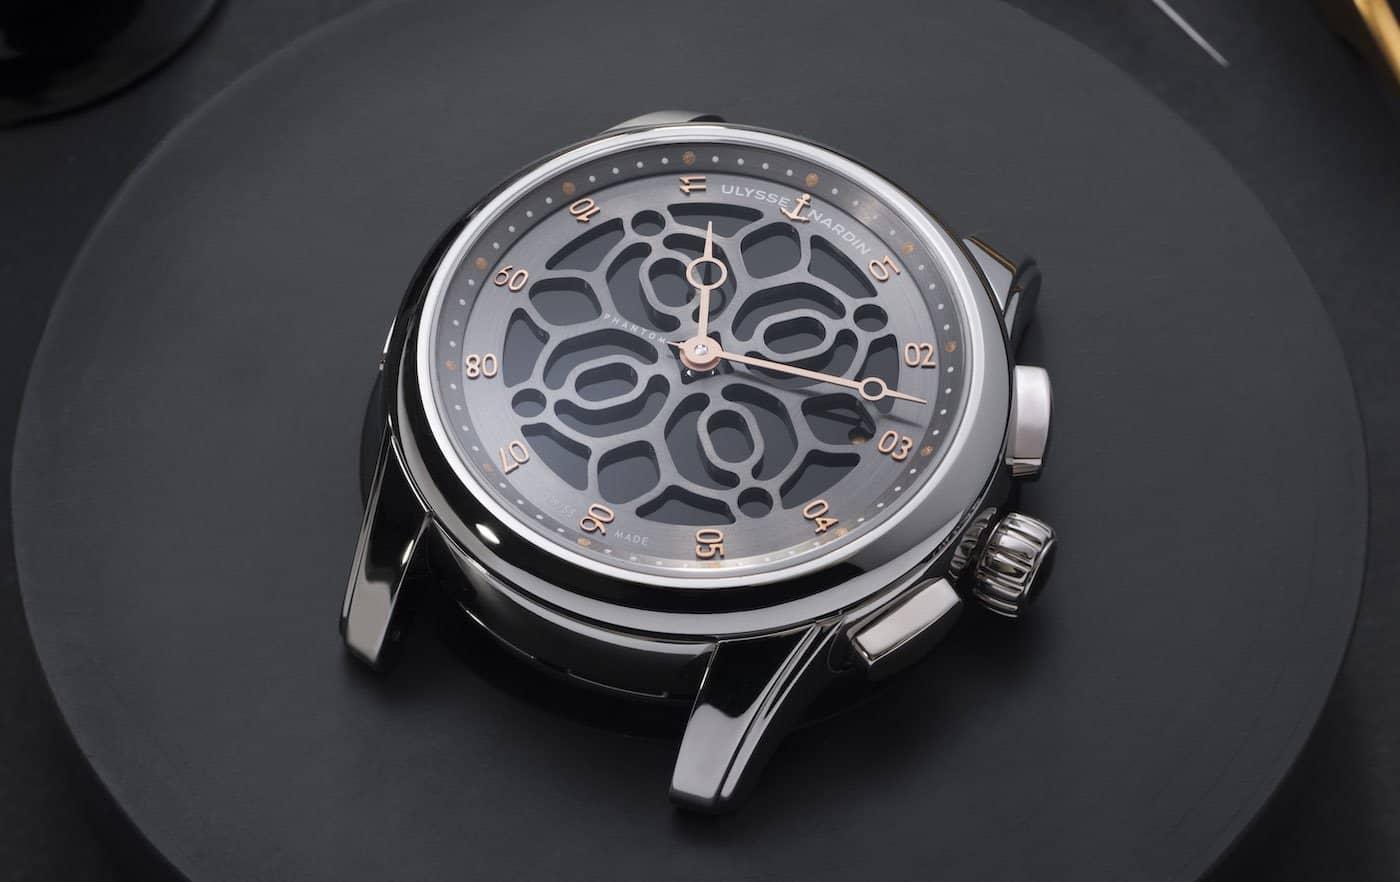 Ulysse Nardin Hourstriker Phantom Limited Edition Watch Devialet 2